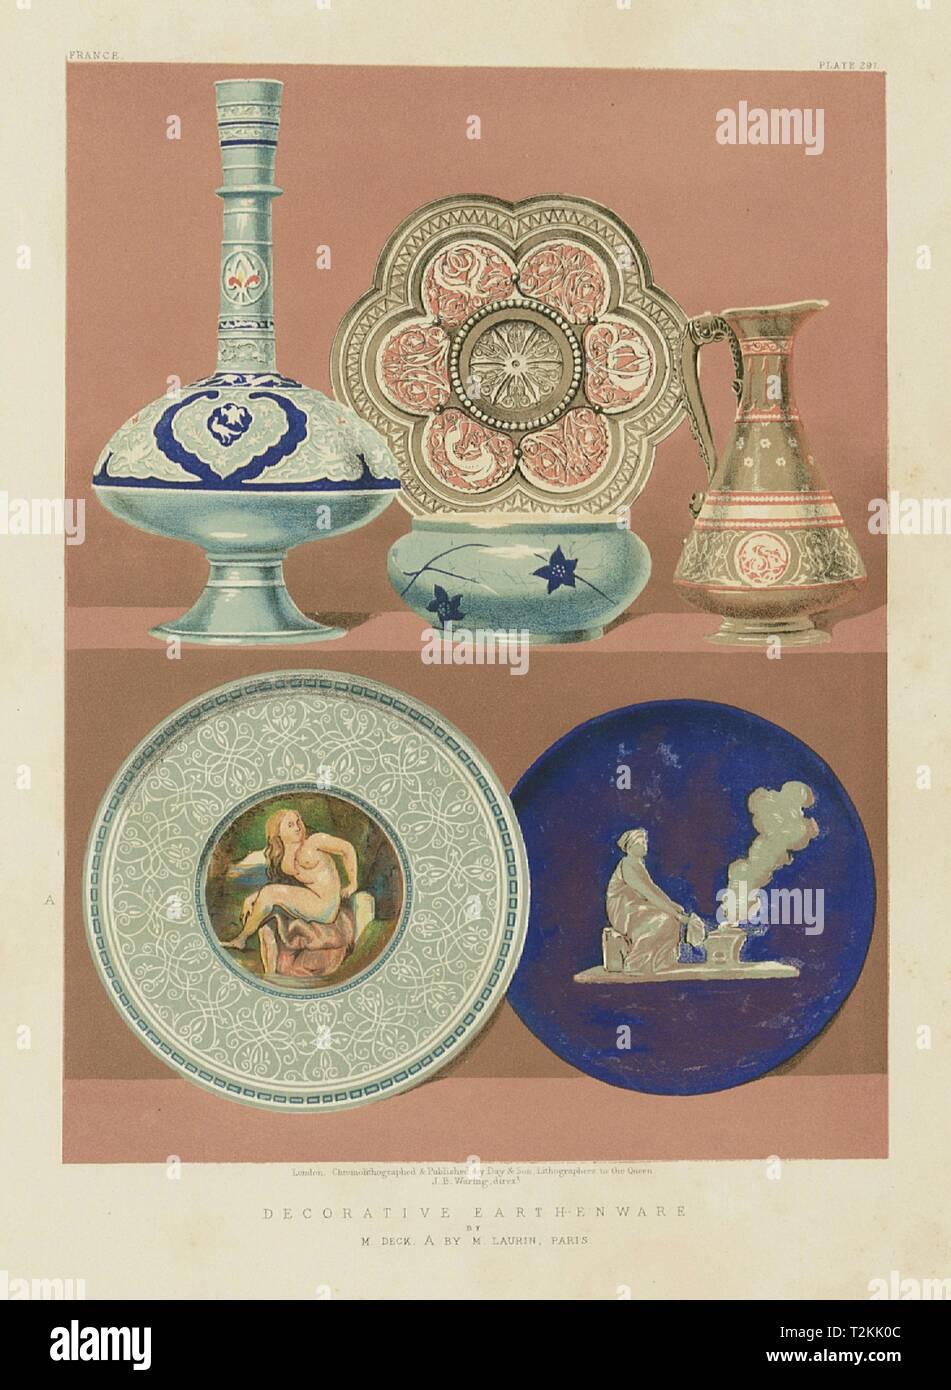 INTERNATIONAL EXHIBITION. Decorative earthenware. Deck A. Laurin, Paris 1862 - Stock Image